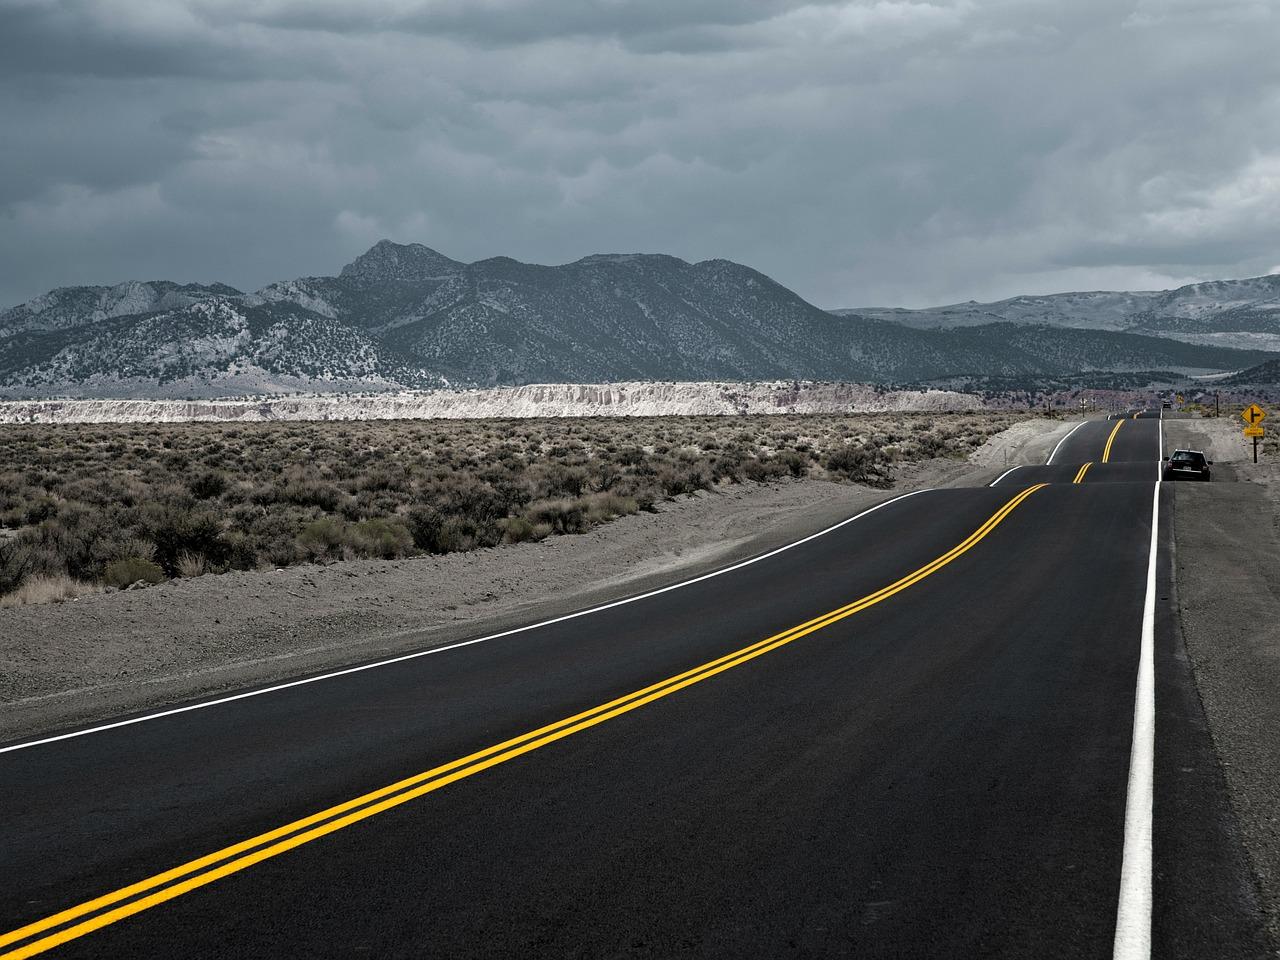 Highway (Bild: Knipsologe, Pixabay)